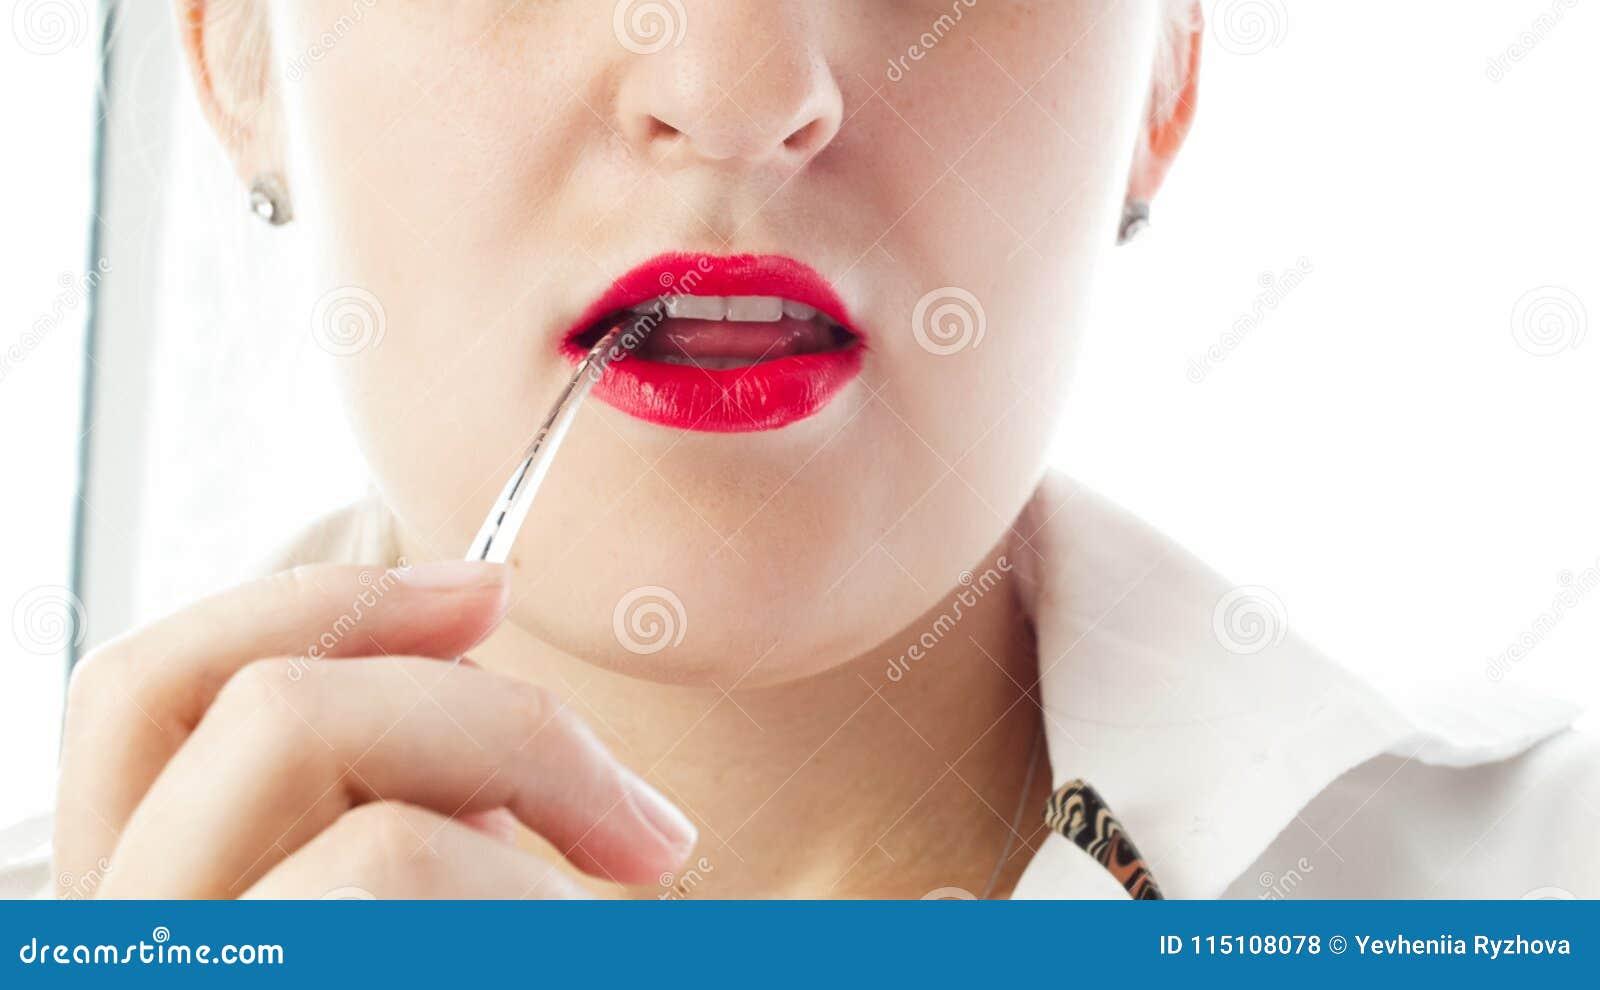 Closeup image of young woman biting eyeglasses earpiece